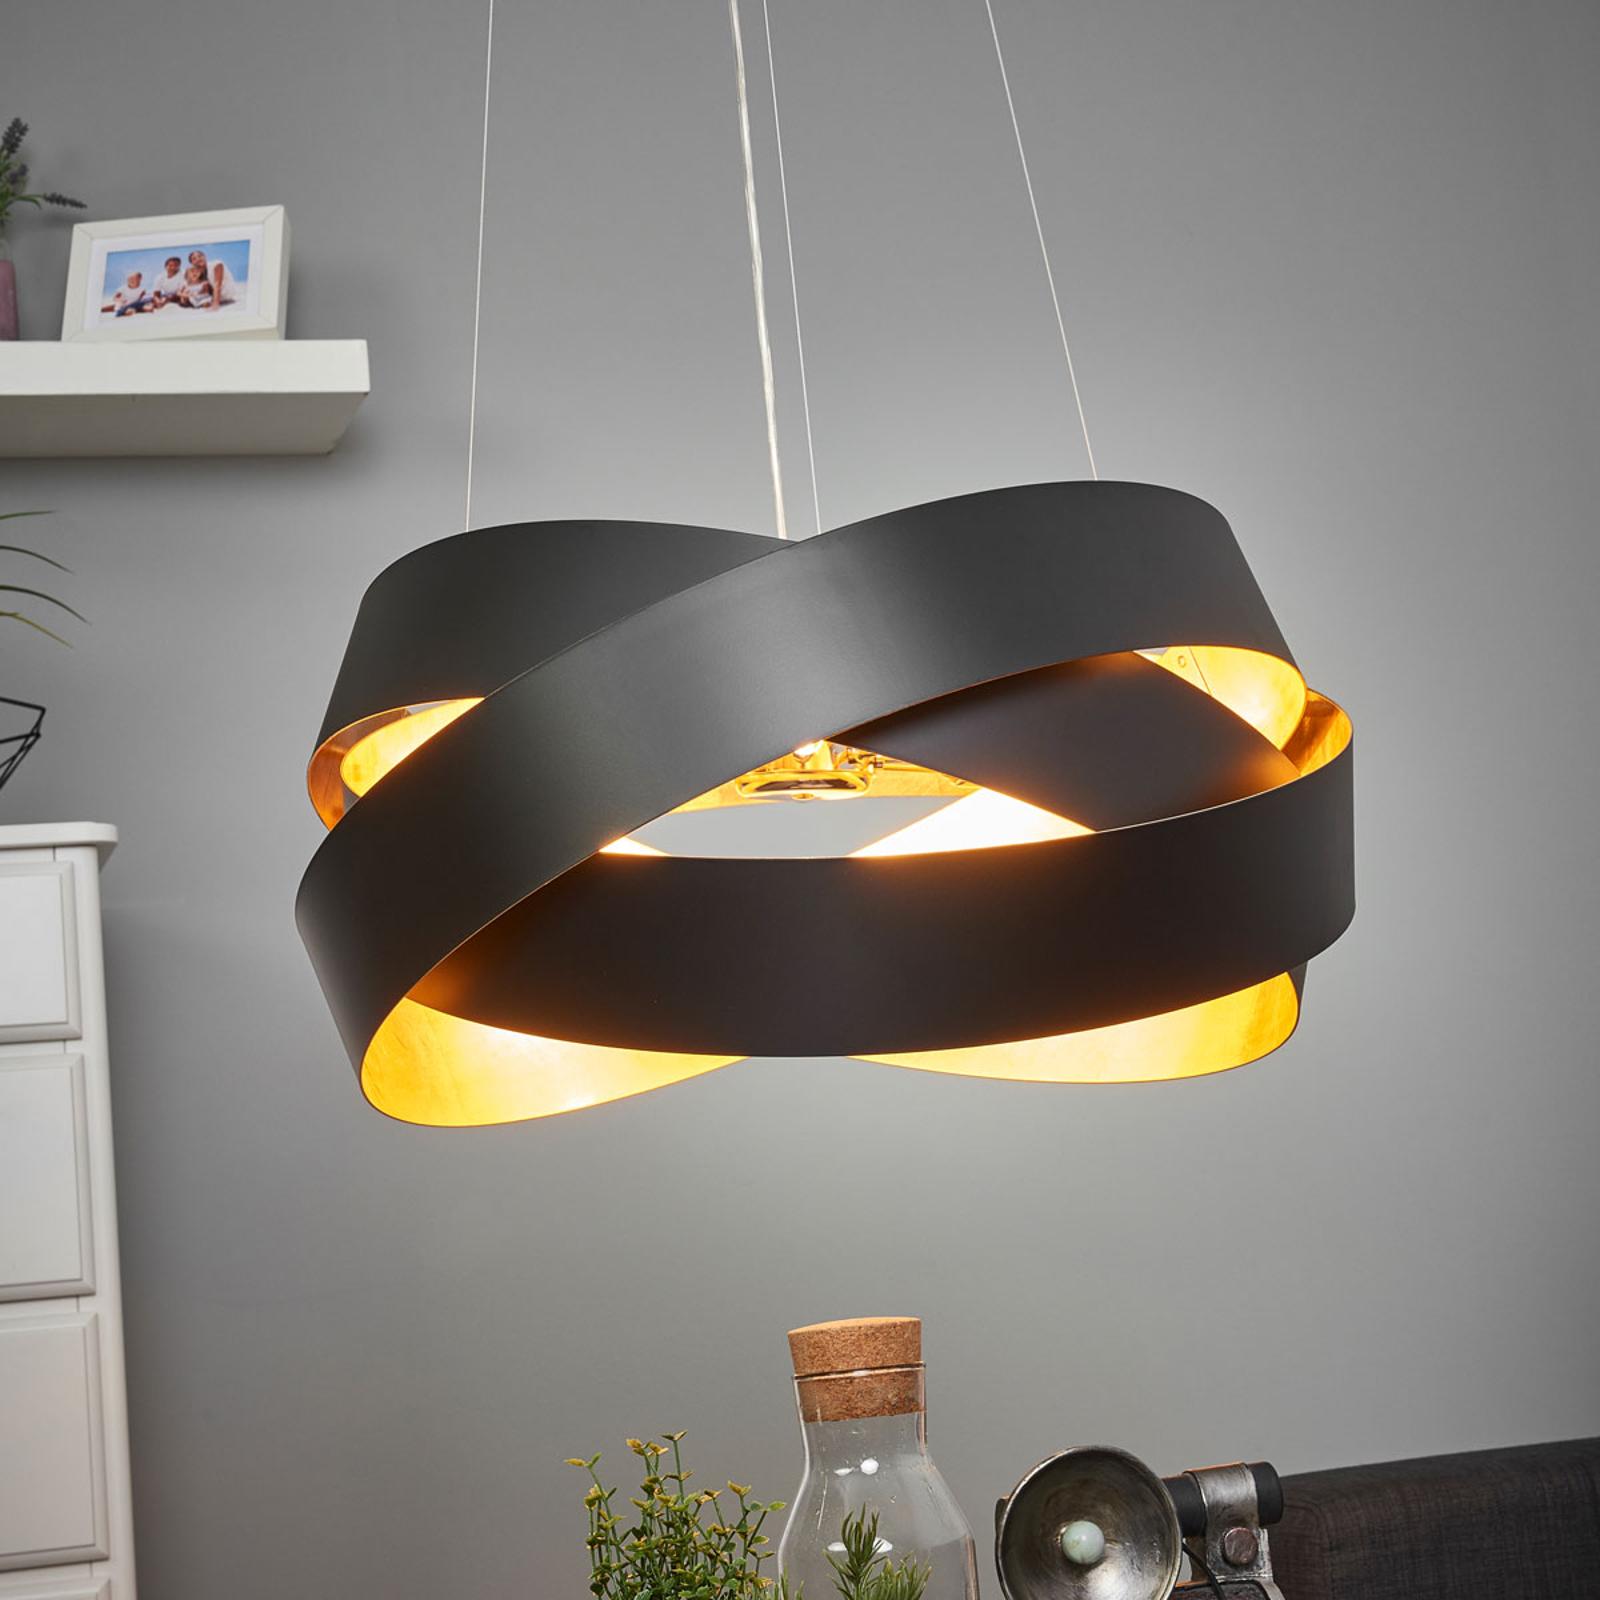 Hanglamp Pura in zwart/goud, 60cm, 8x G9